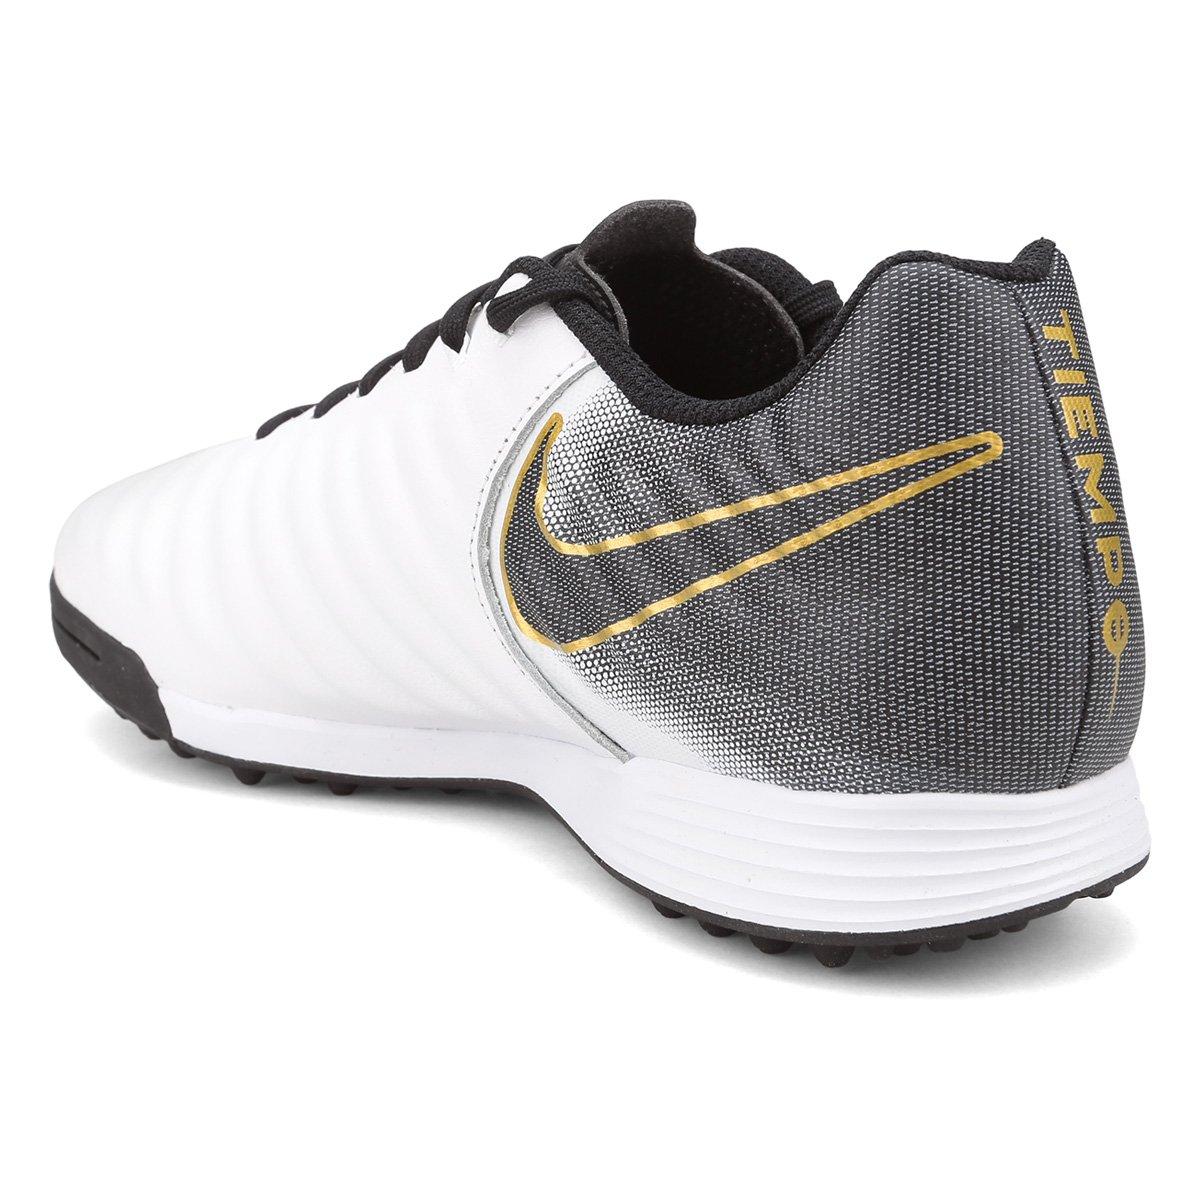 f1003b58e8 Chuteira Society Nike Tiempo Legend 7 Academy TF Masculina - Compre ...